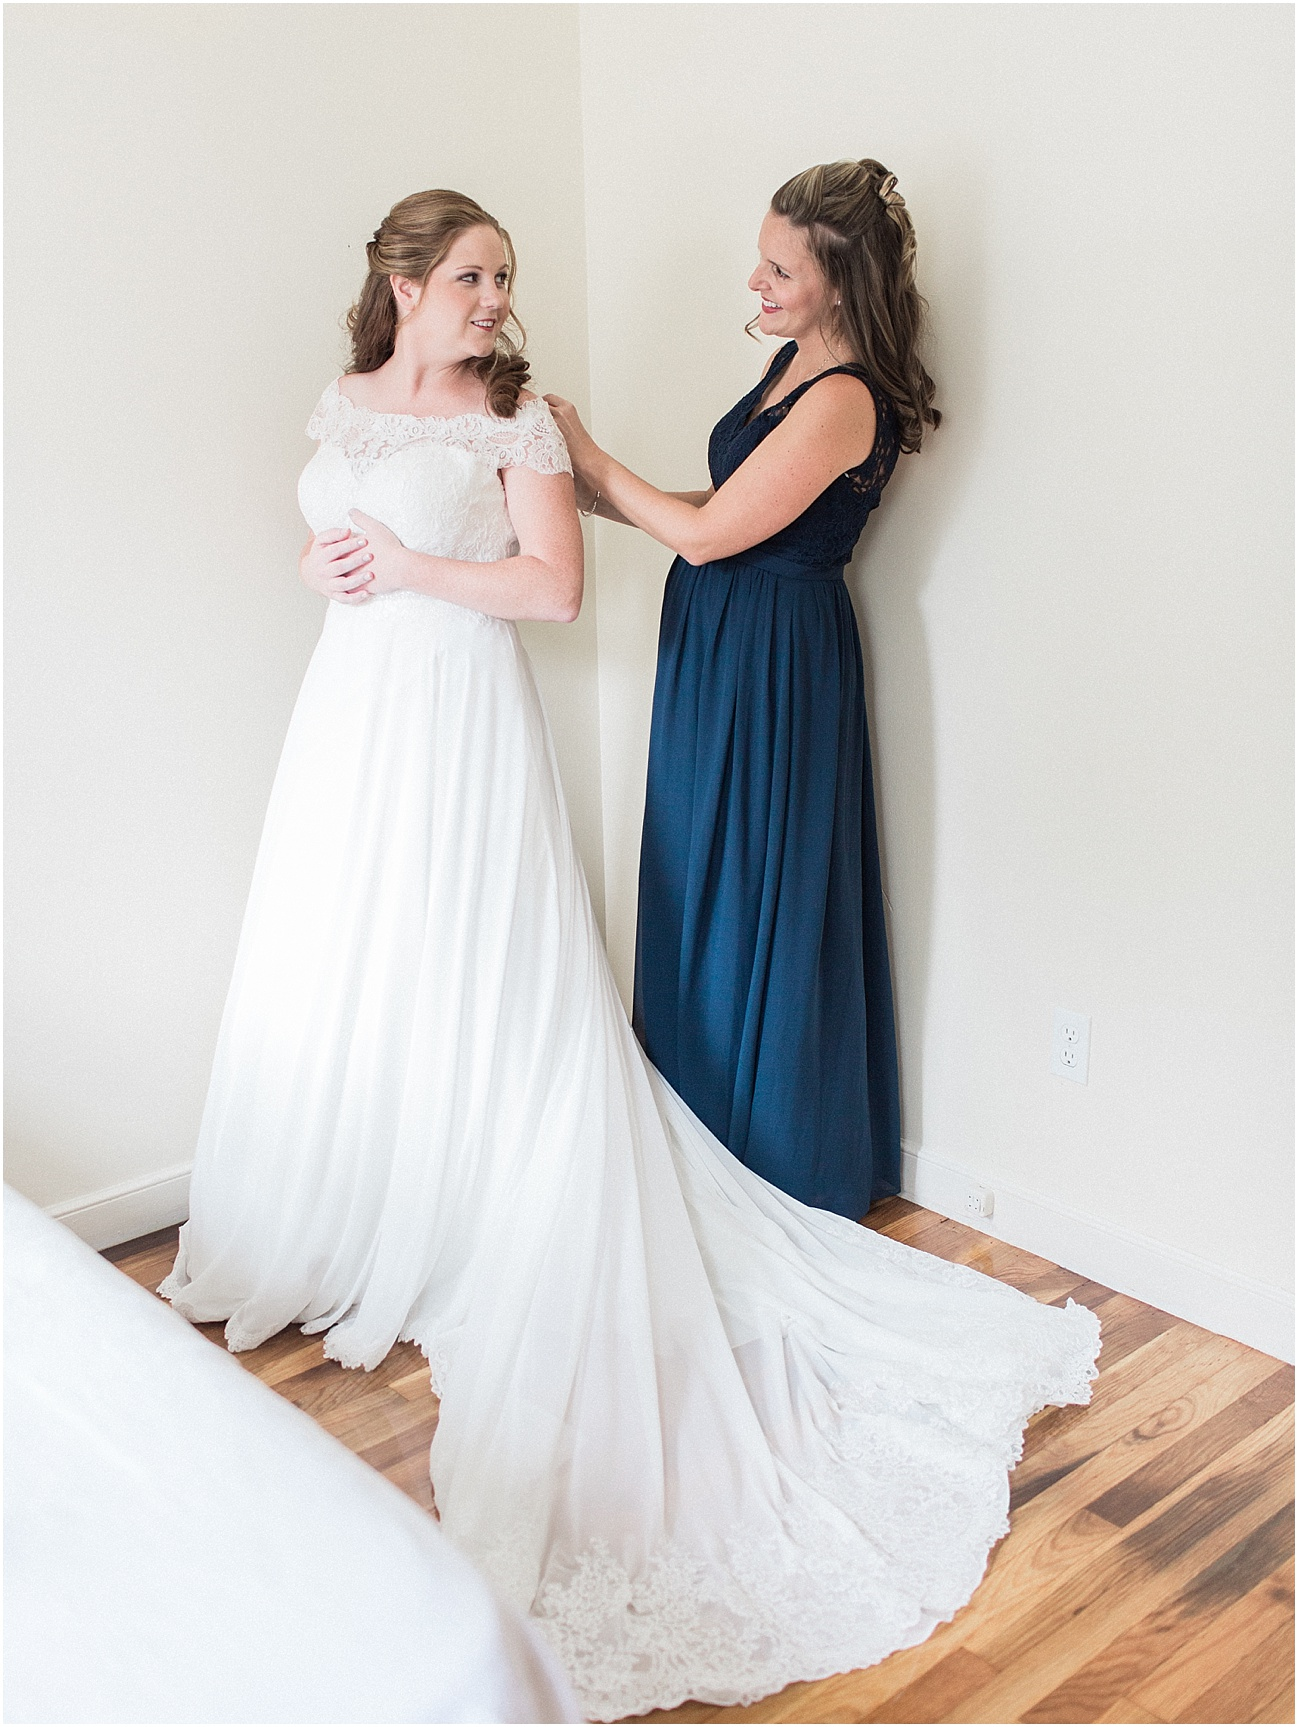 jaclyn_adam_st_ann_brendans_dorchester_southie_castle_bride_groom_venezia_waterfront__cape_cod_boston_wedding_photographer_meredith_jane_photography_photo_0890.jpg